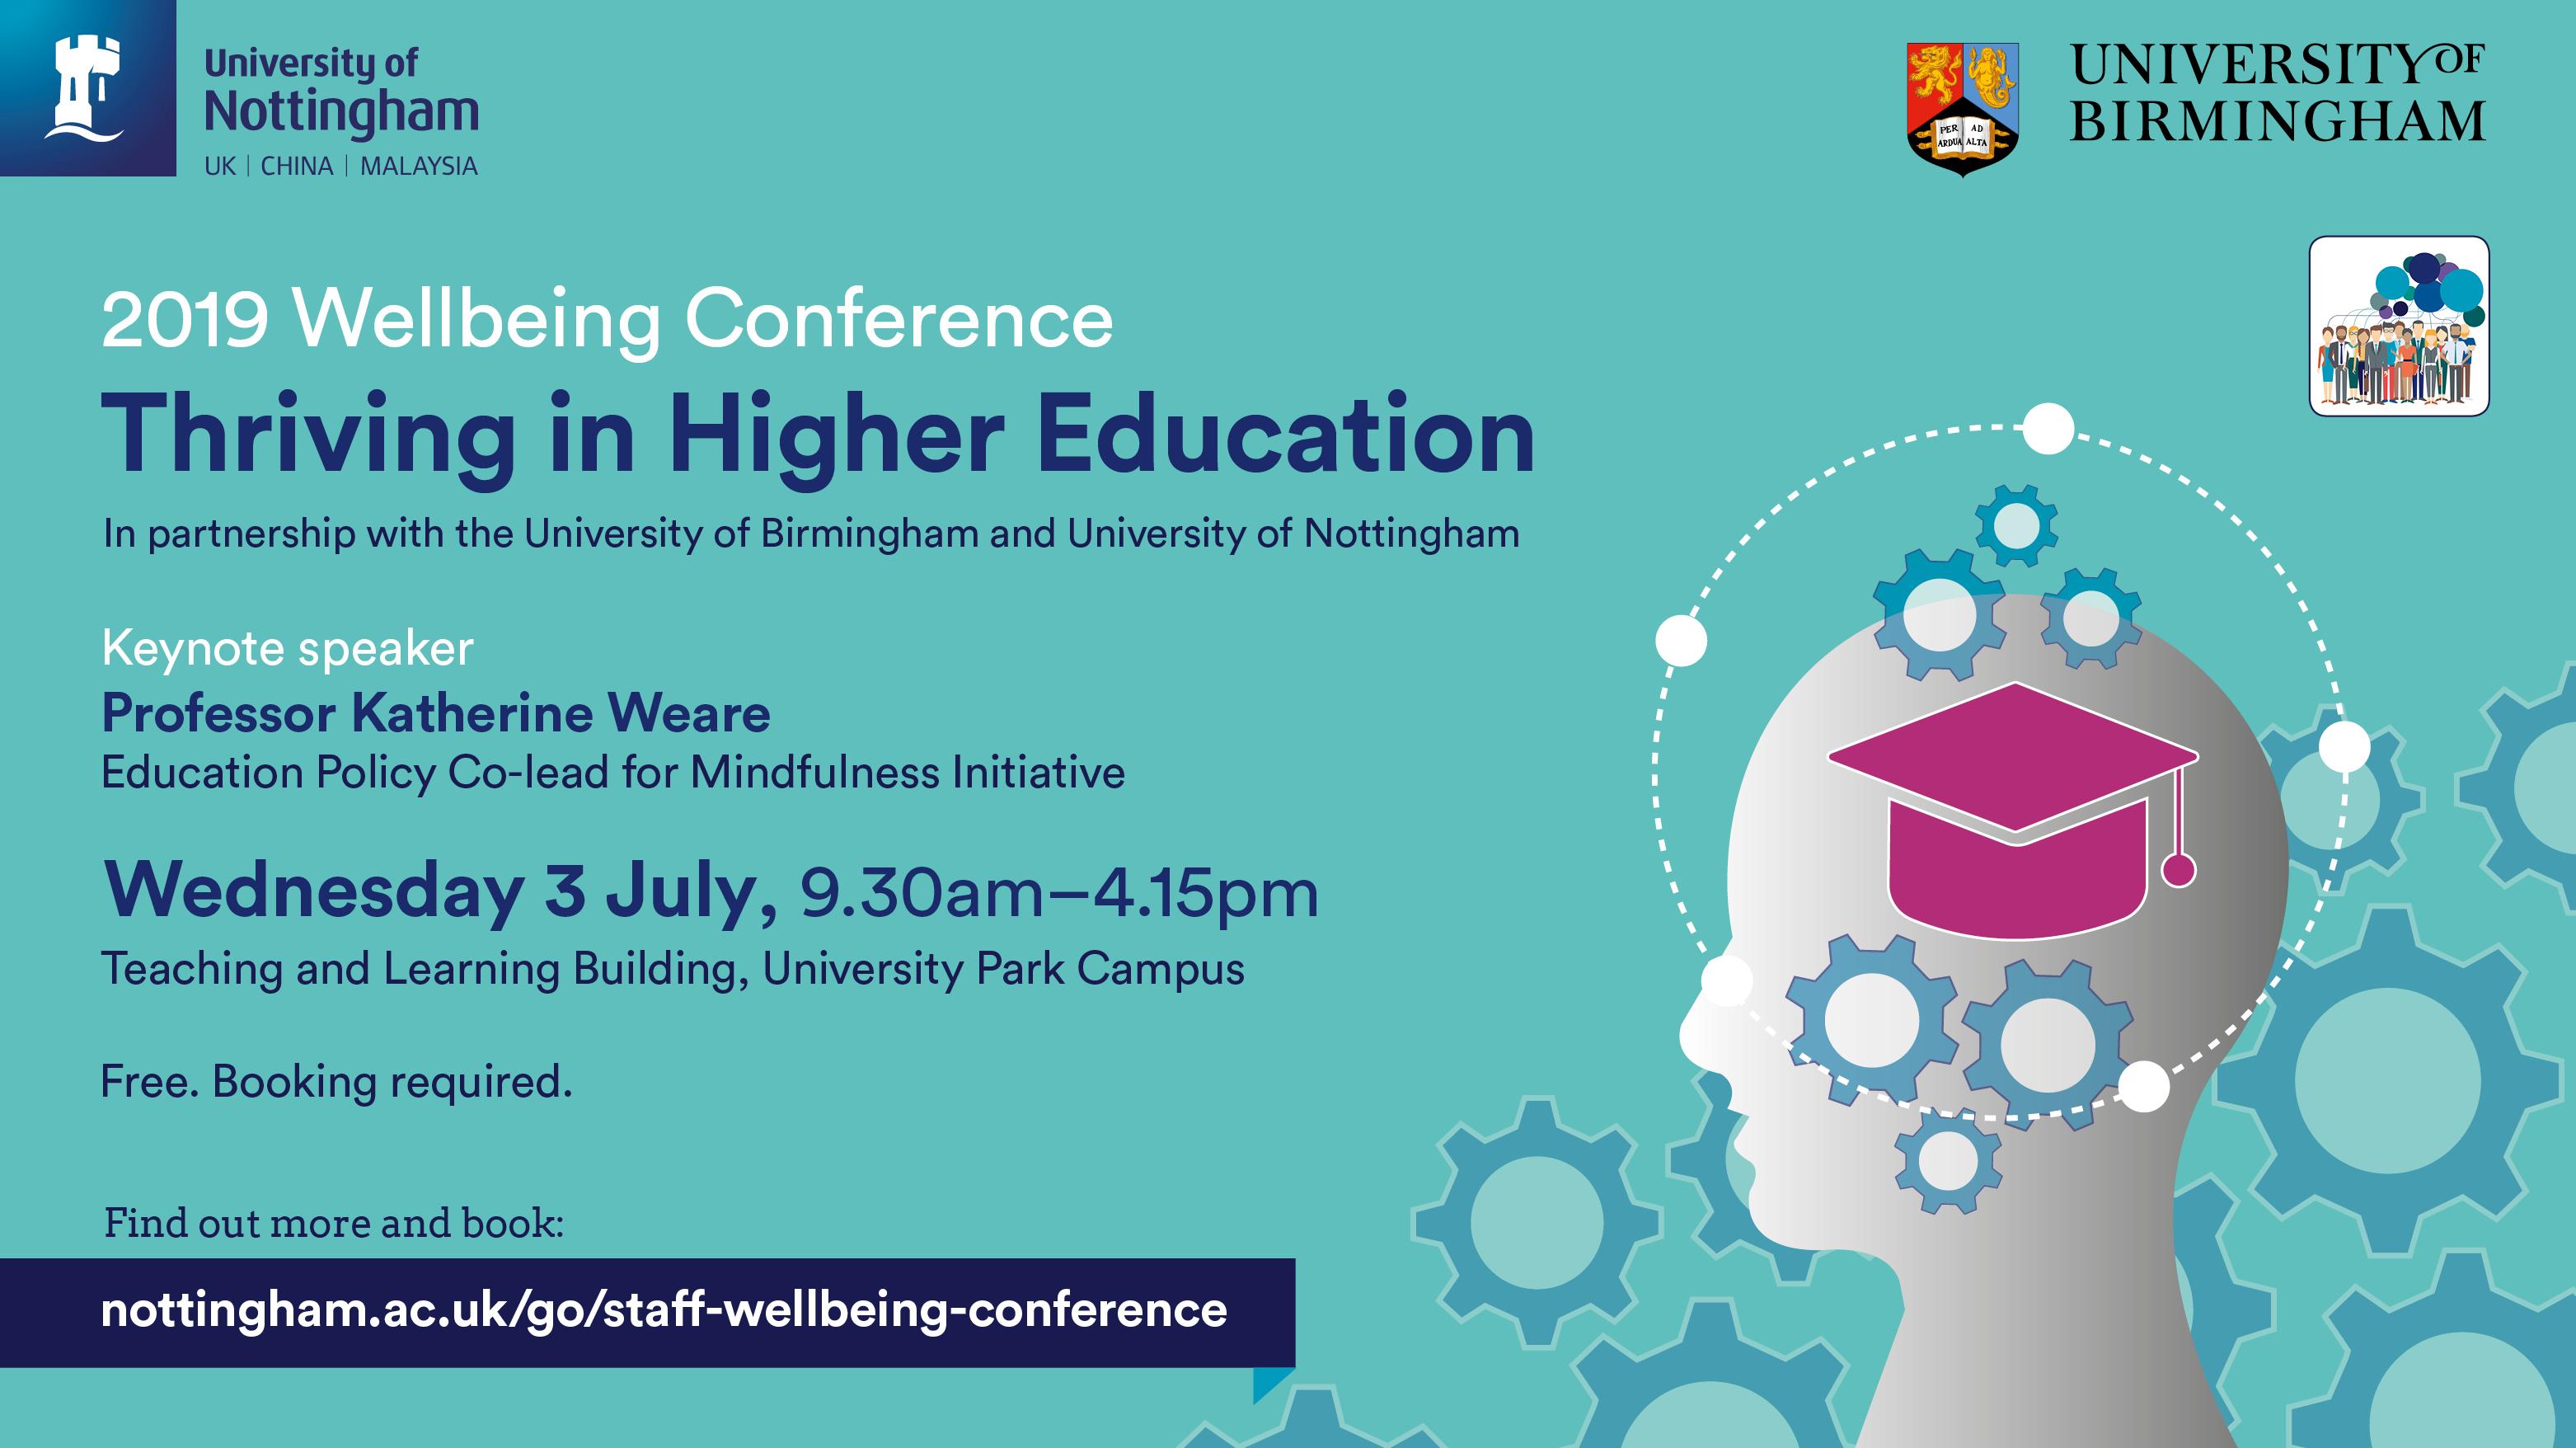 Higher Education Conferences 2019 Uk - Best Education 2019